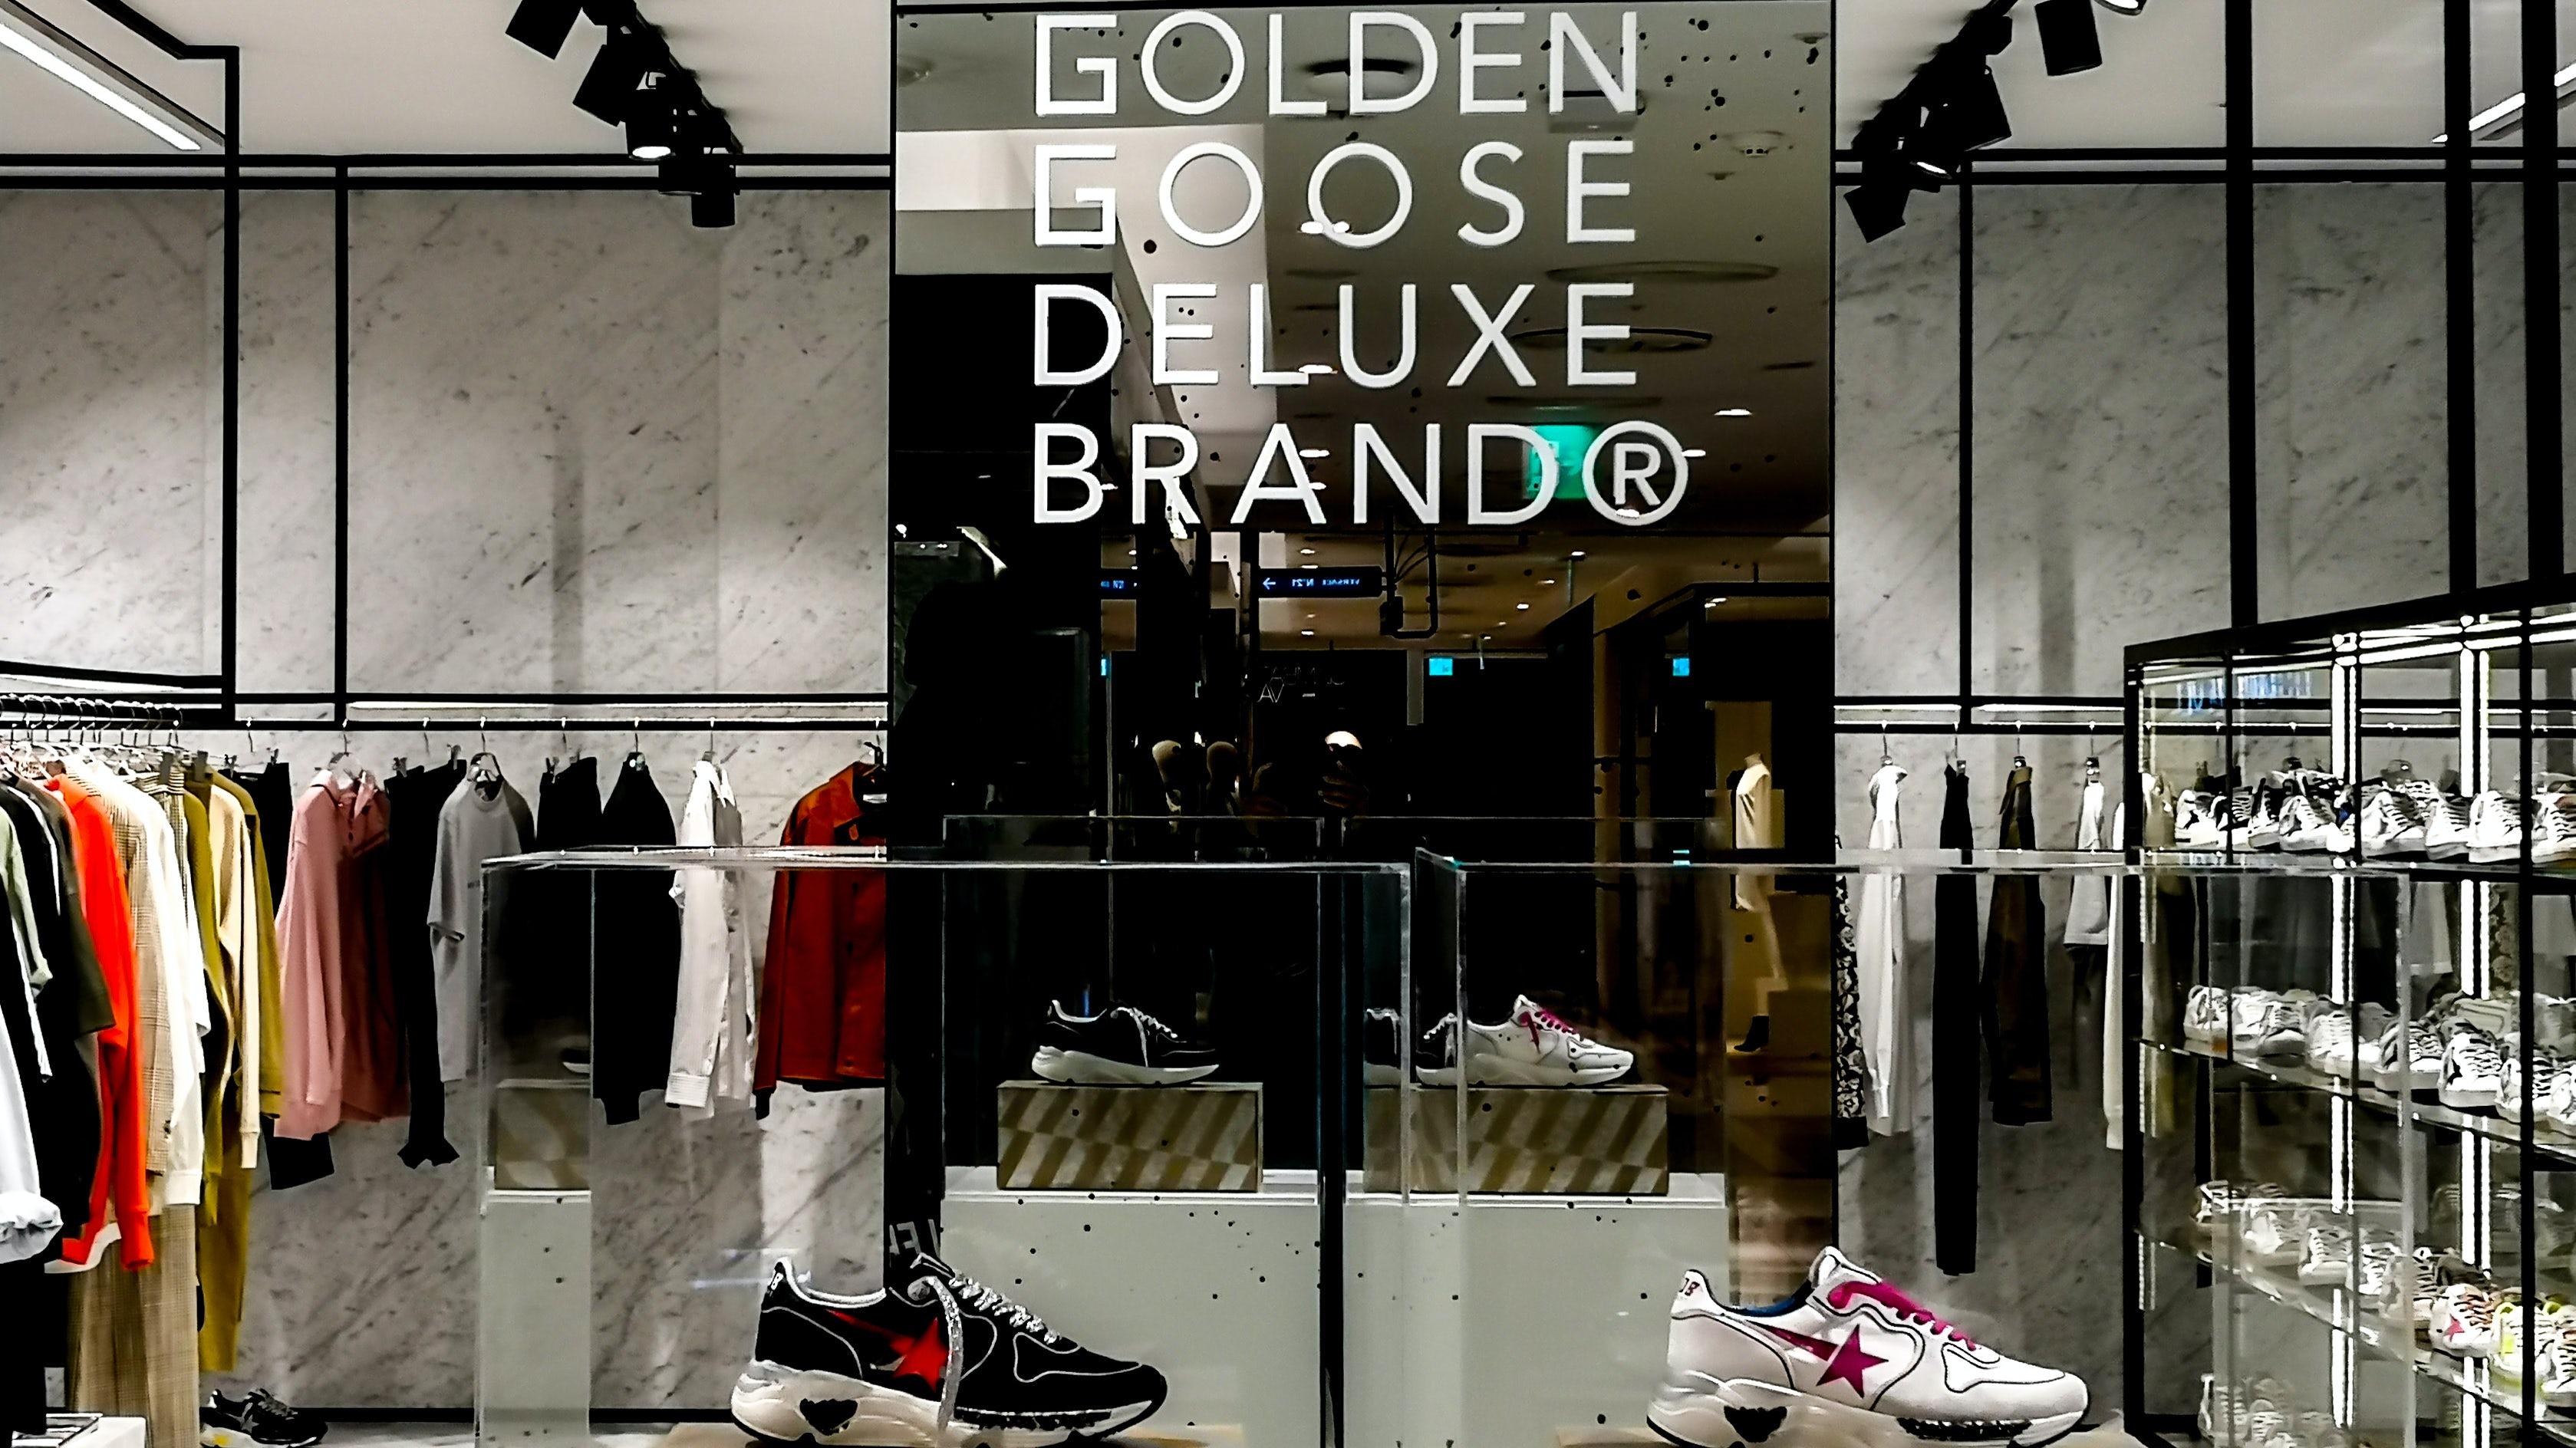 Shoe Brand Golden Goose